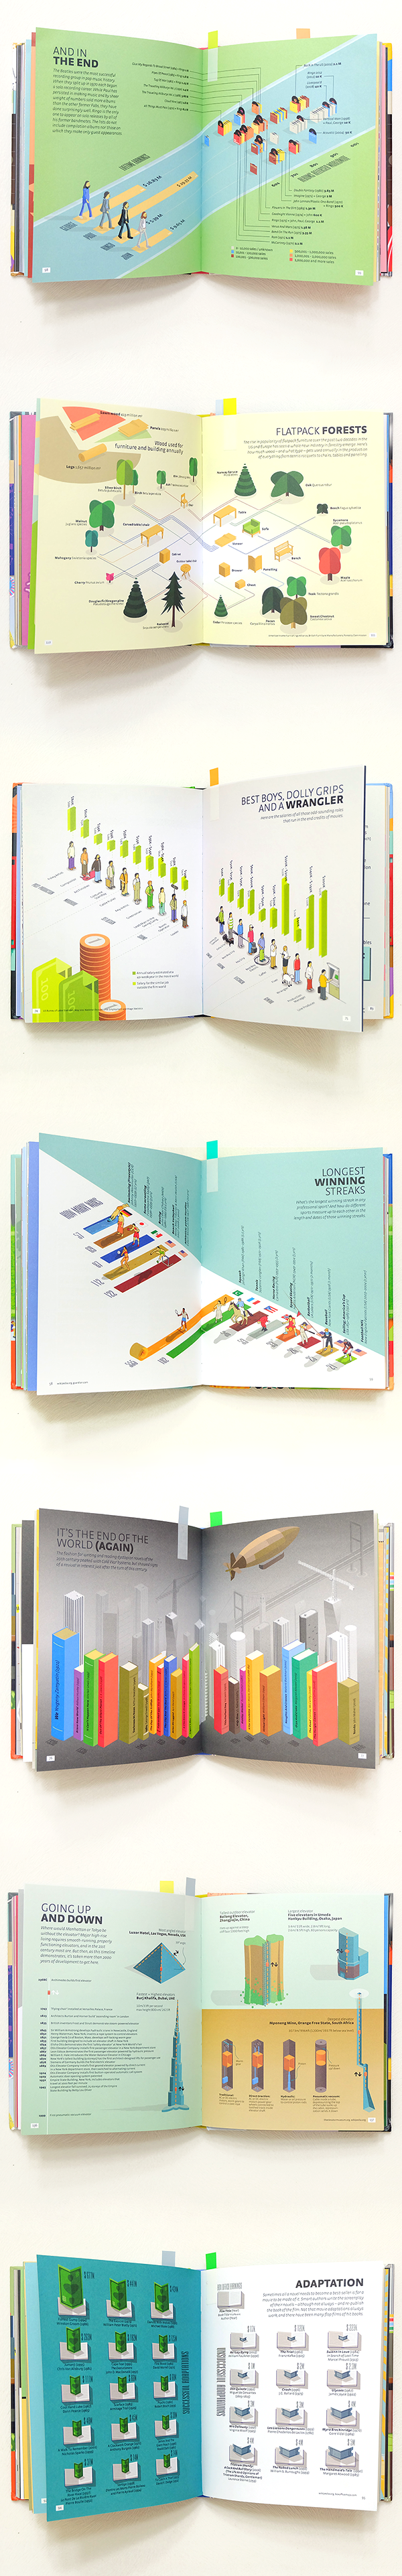 Loves Data Loves || Book of infographics | #infographic #illustrations #data https://www.behance.net/gallery/21048177/infographic-guide-to-